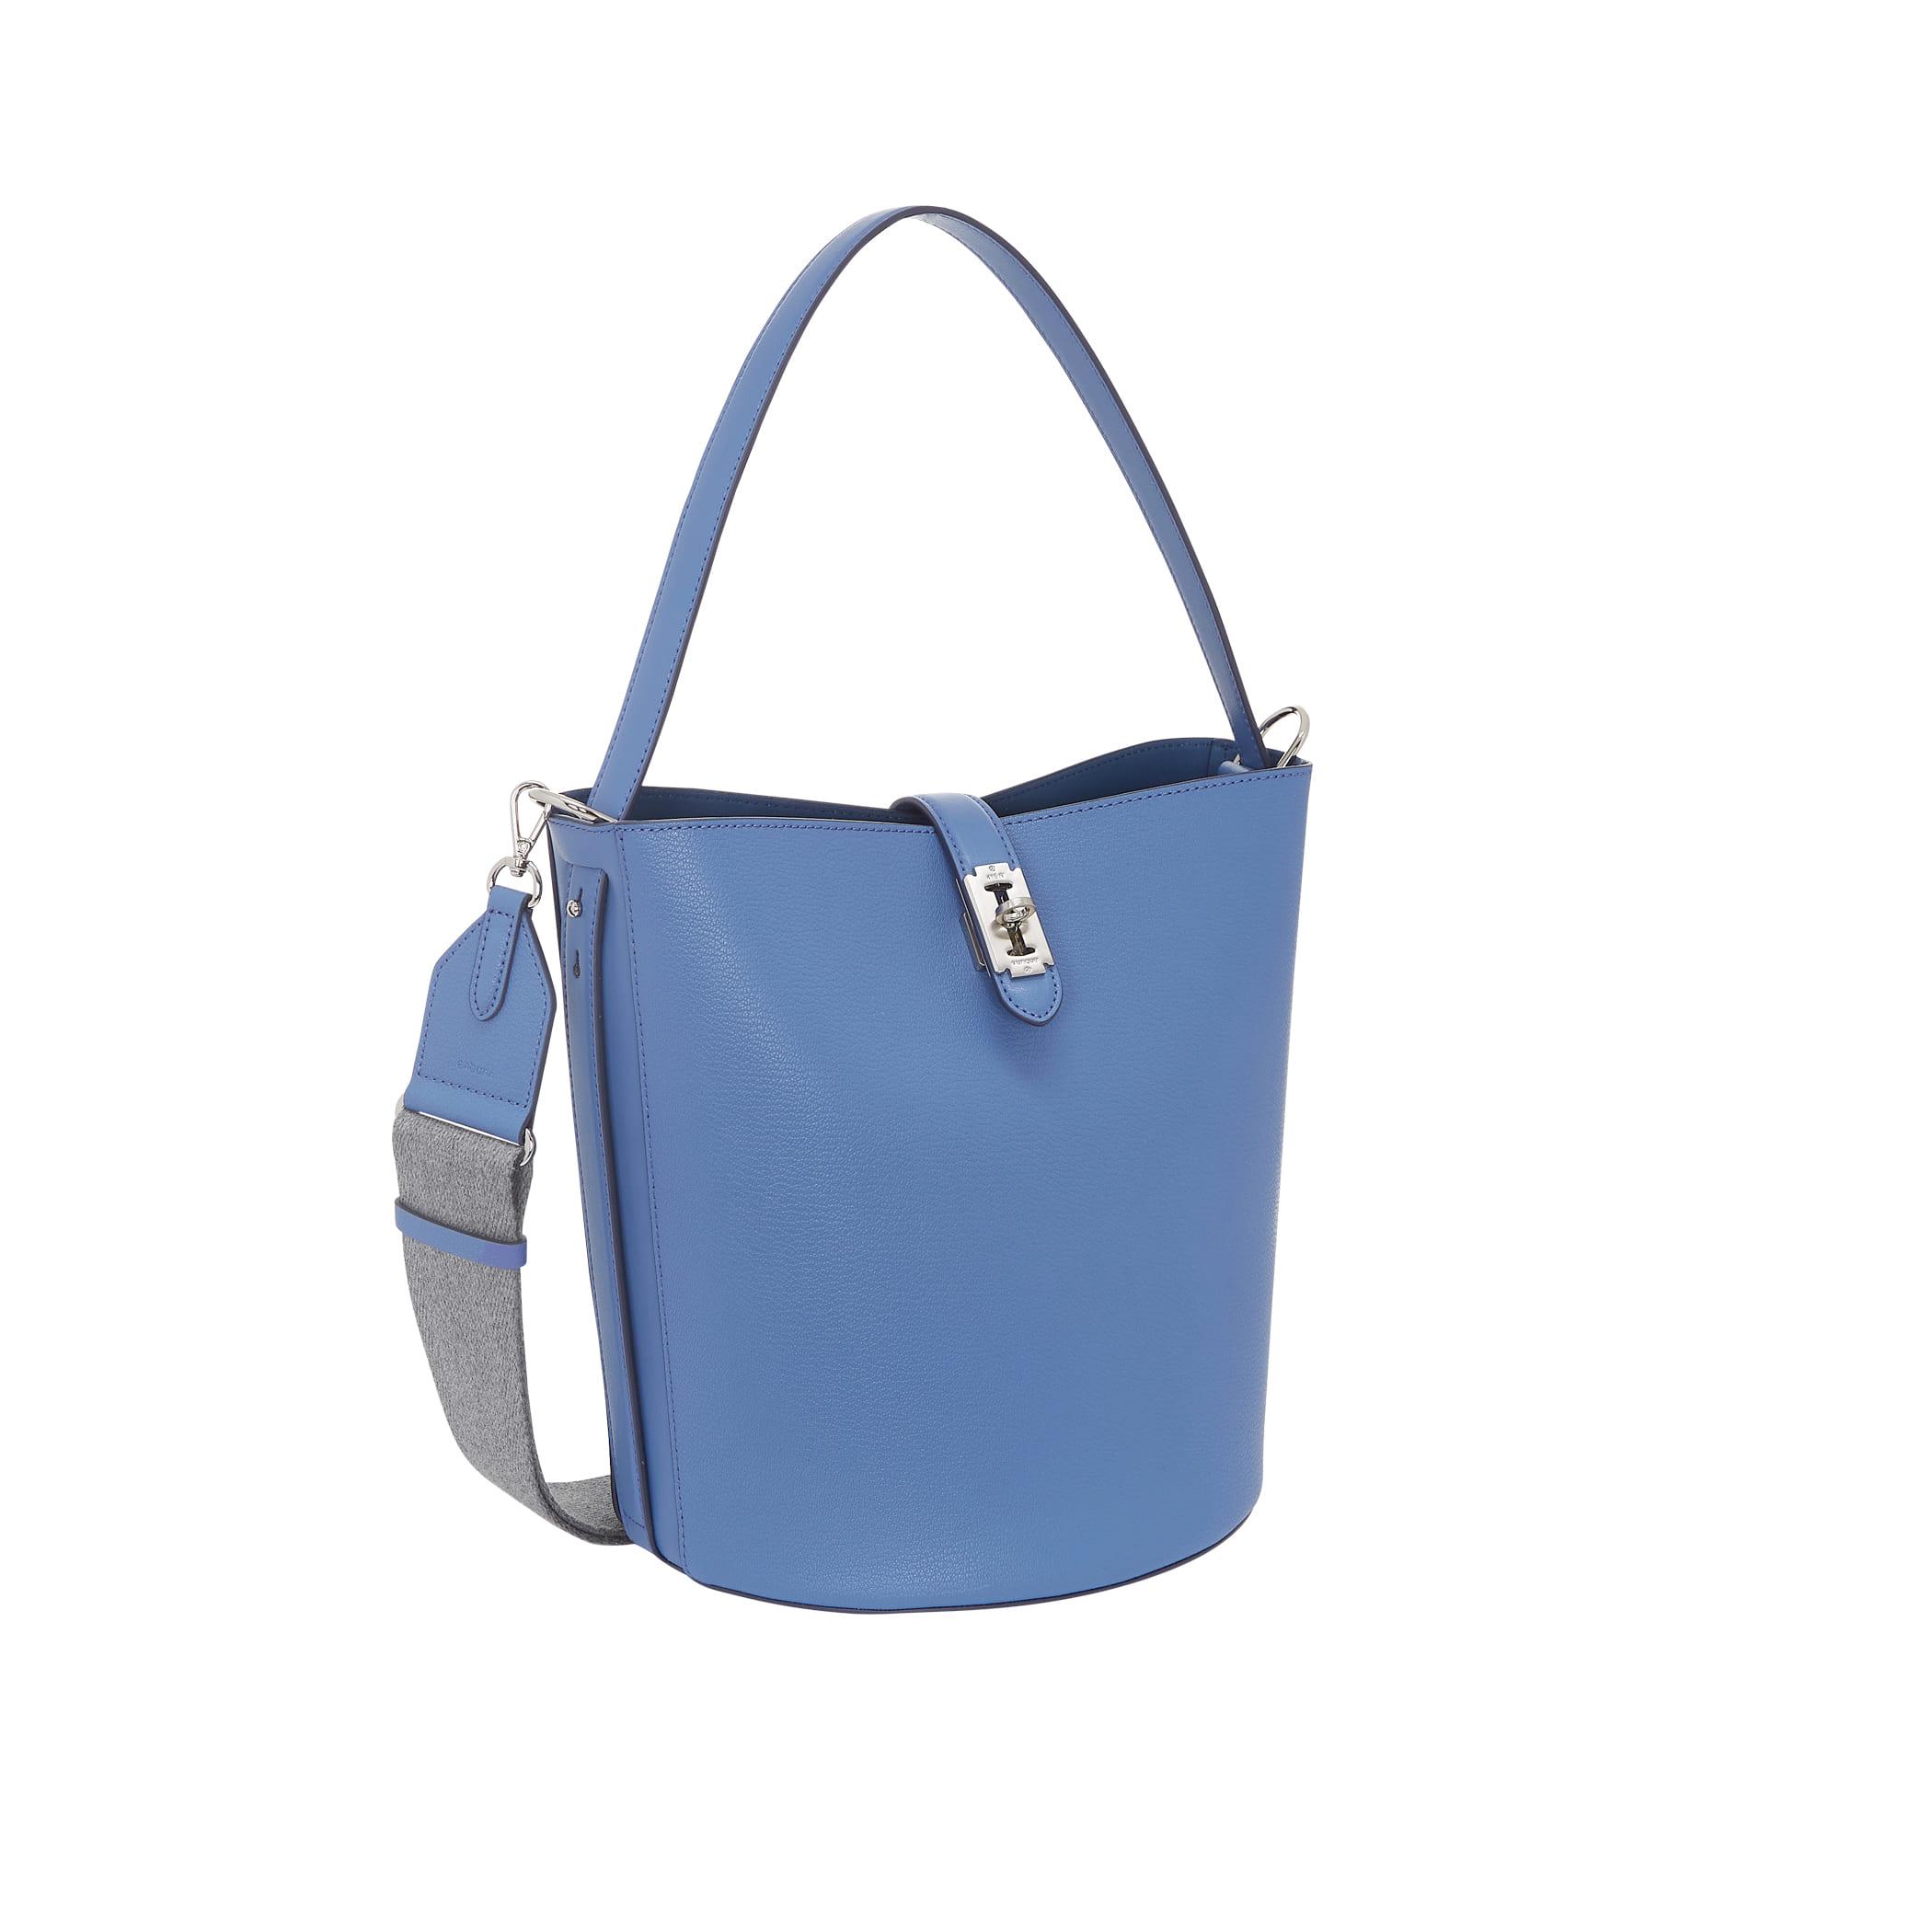 Boogie Hobo M (부기 호보 M) Calm blue